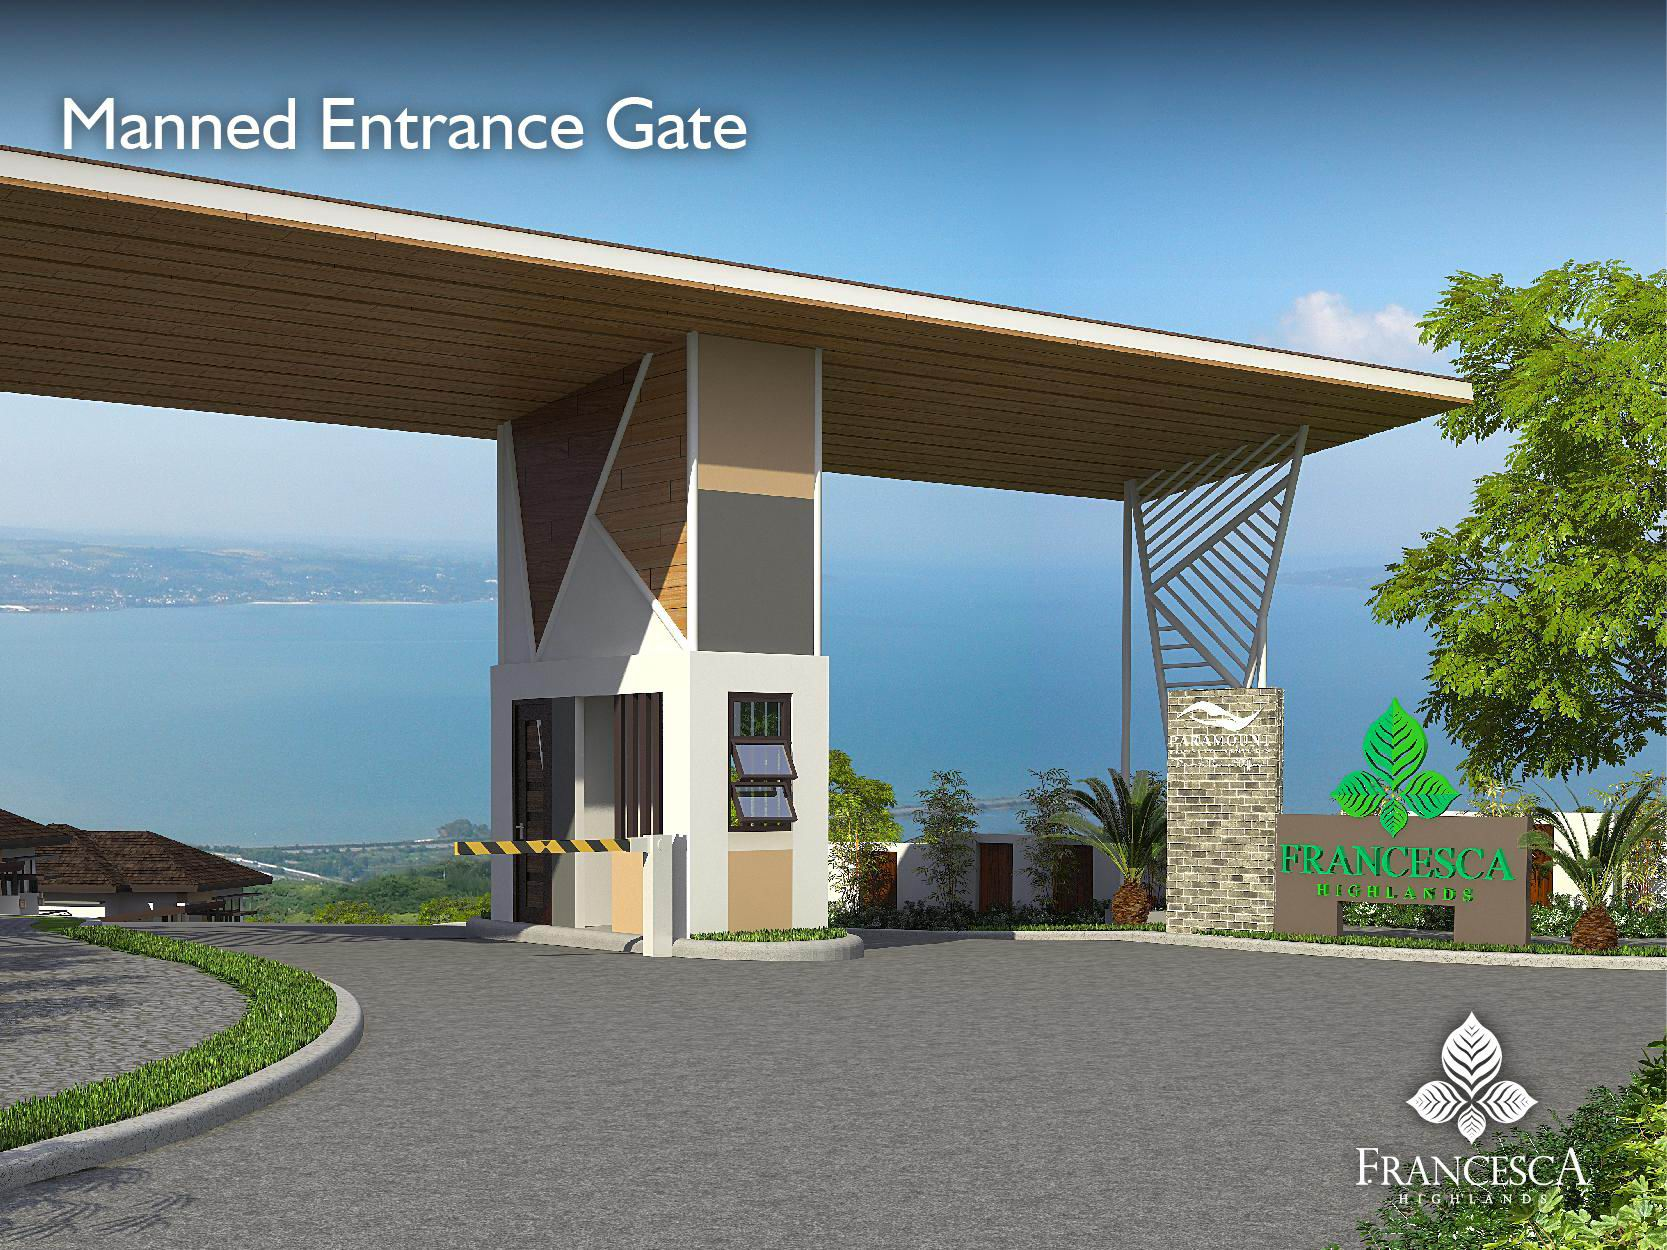 Manned Entrance Gate